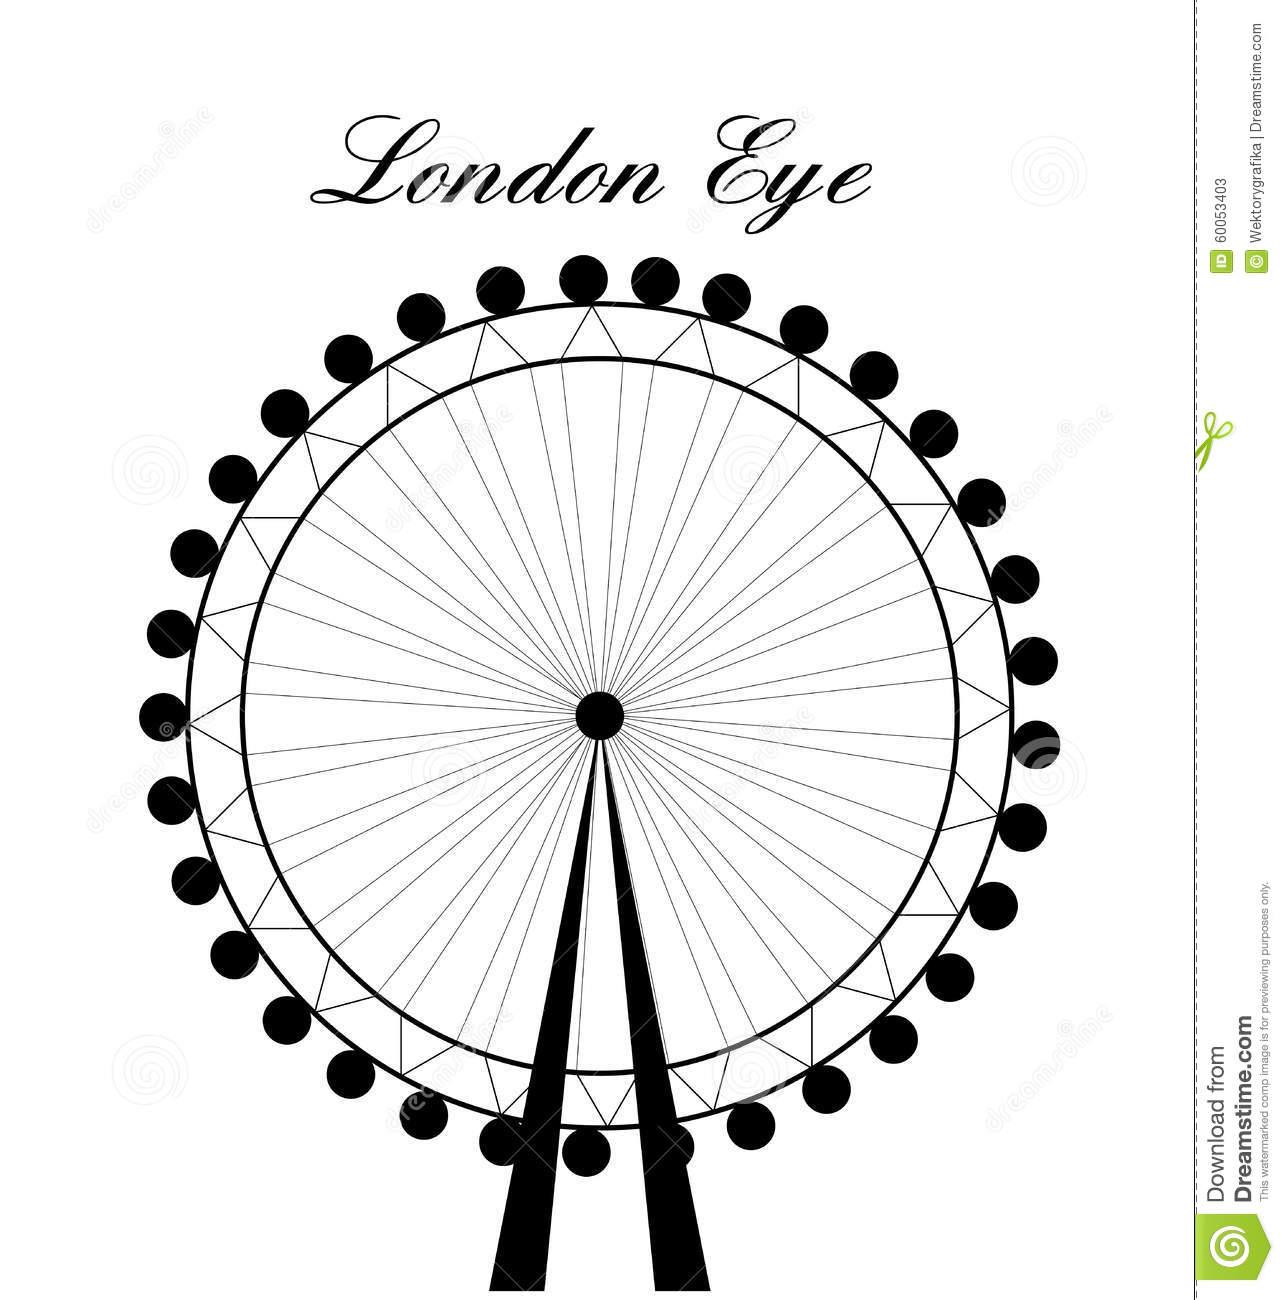 1284x1300 Drawn Ferris Wheel London Eye